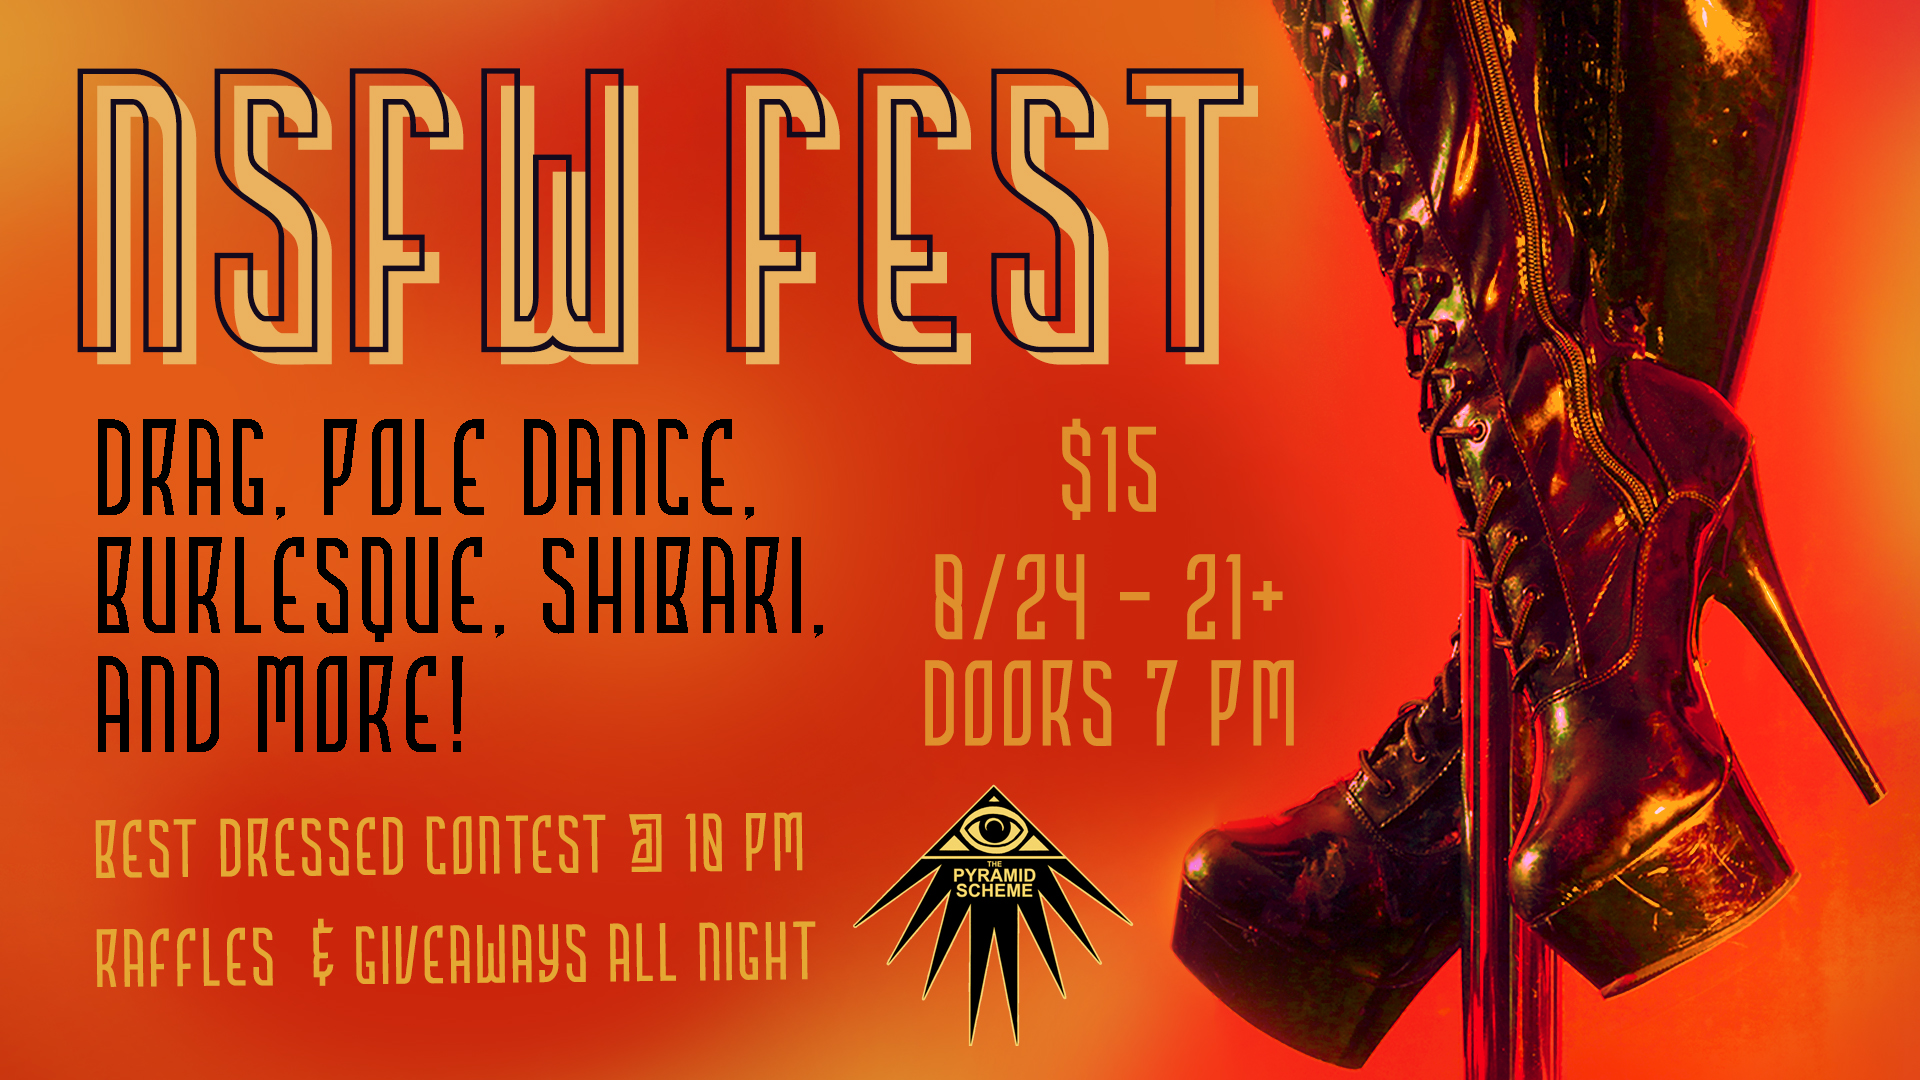 NSFW Fest Aug 24 FB.jpg